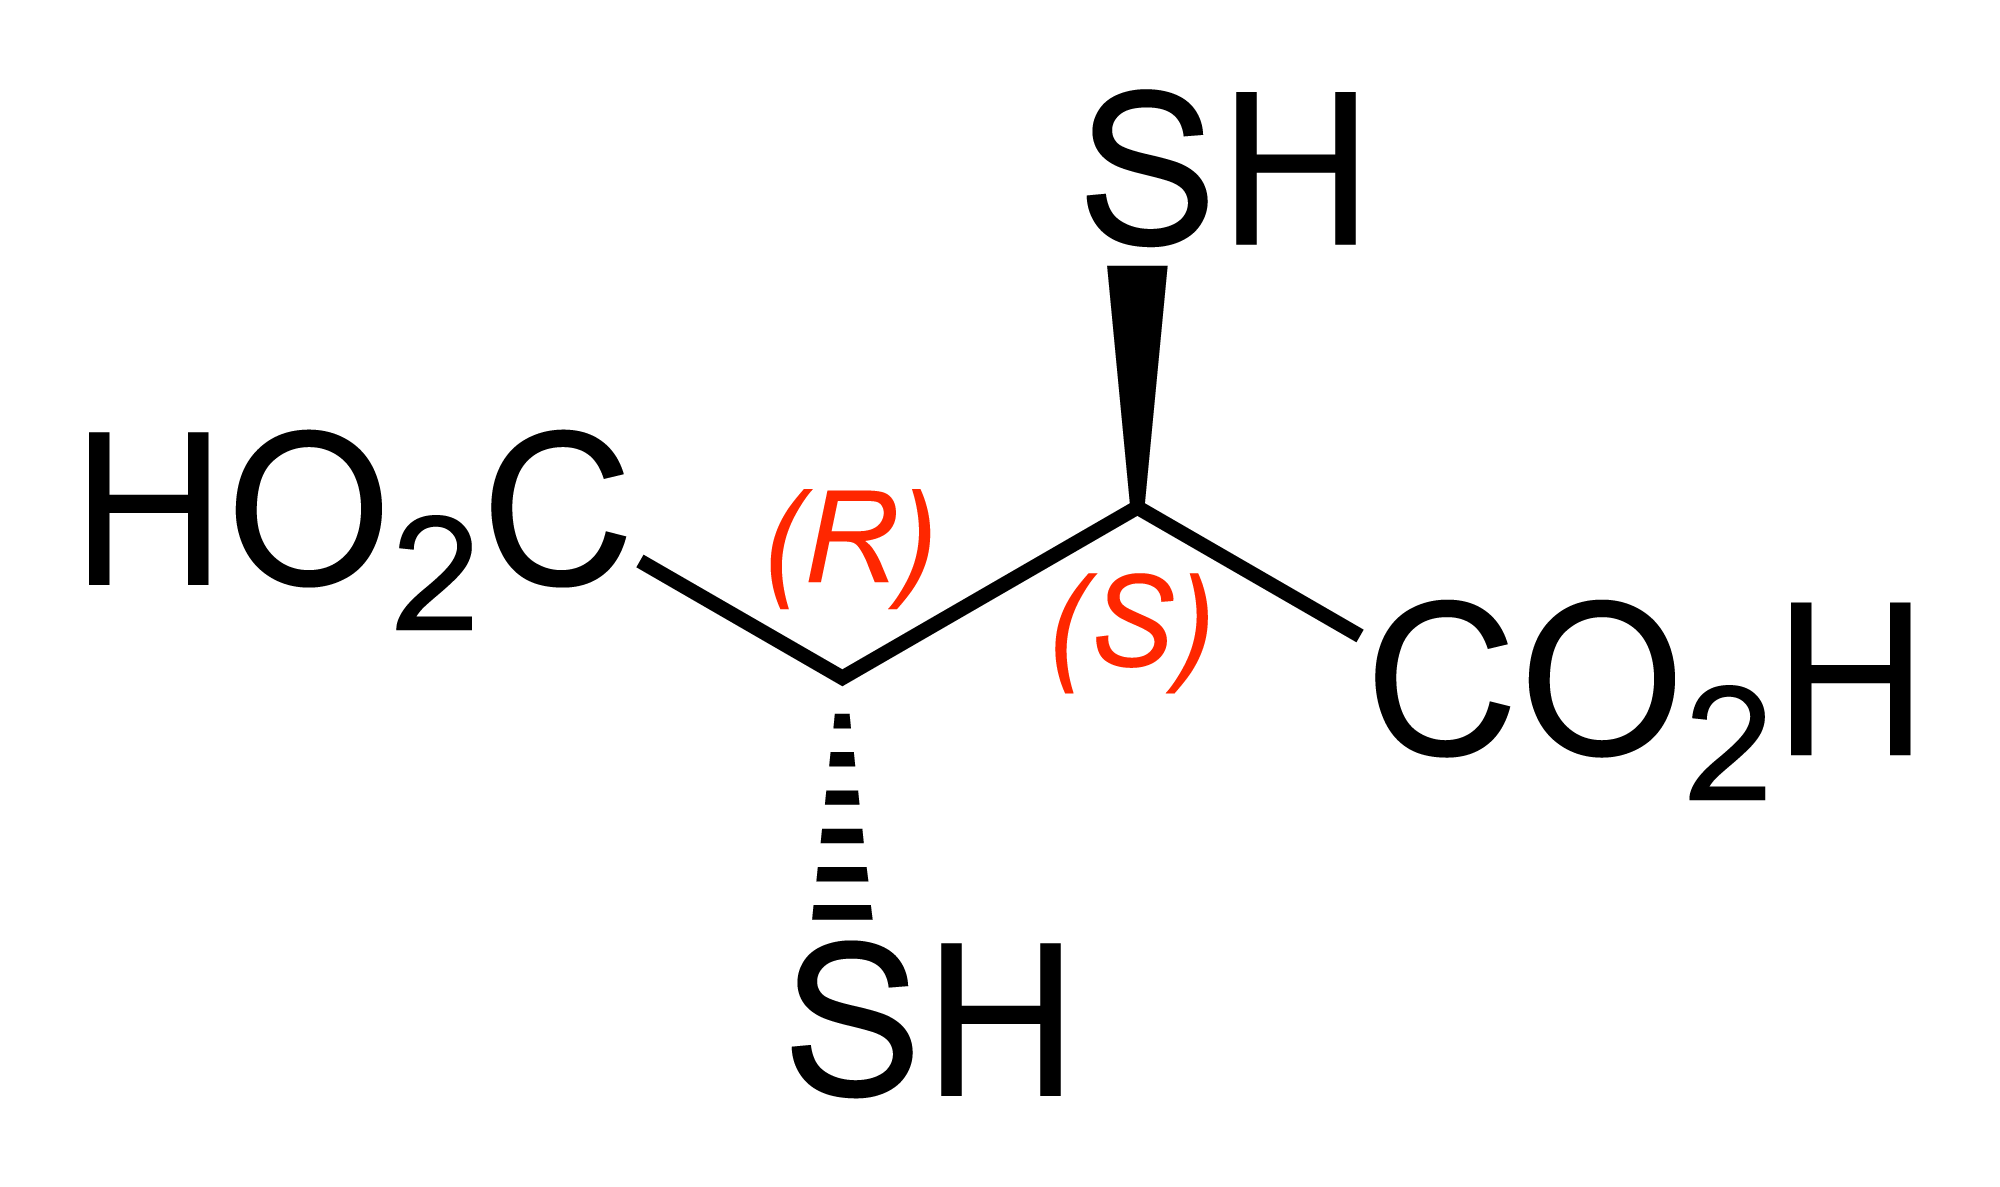 Dimercaptosuccinic acid - Wikipedia